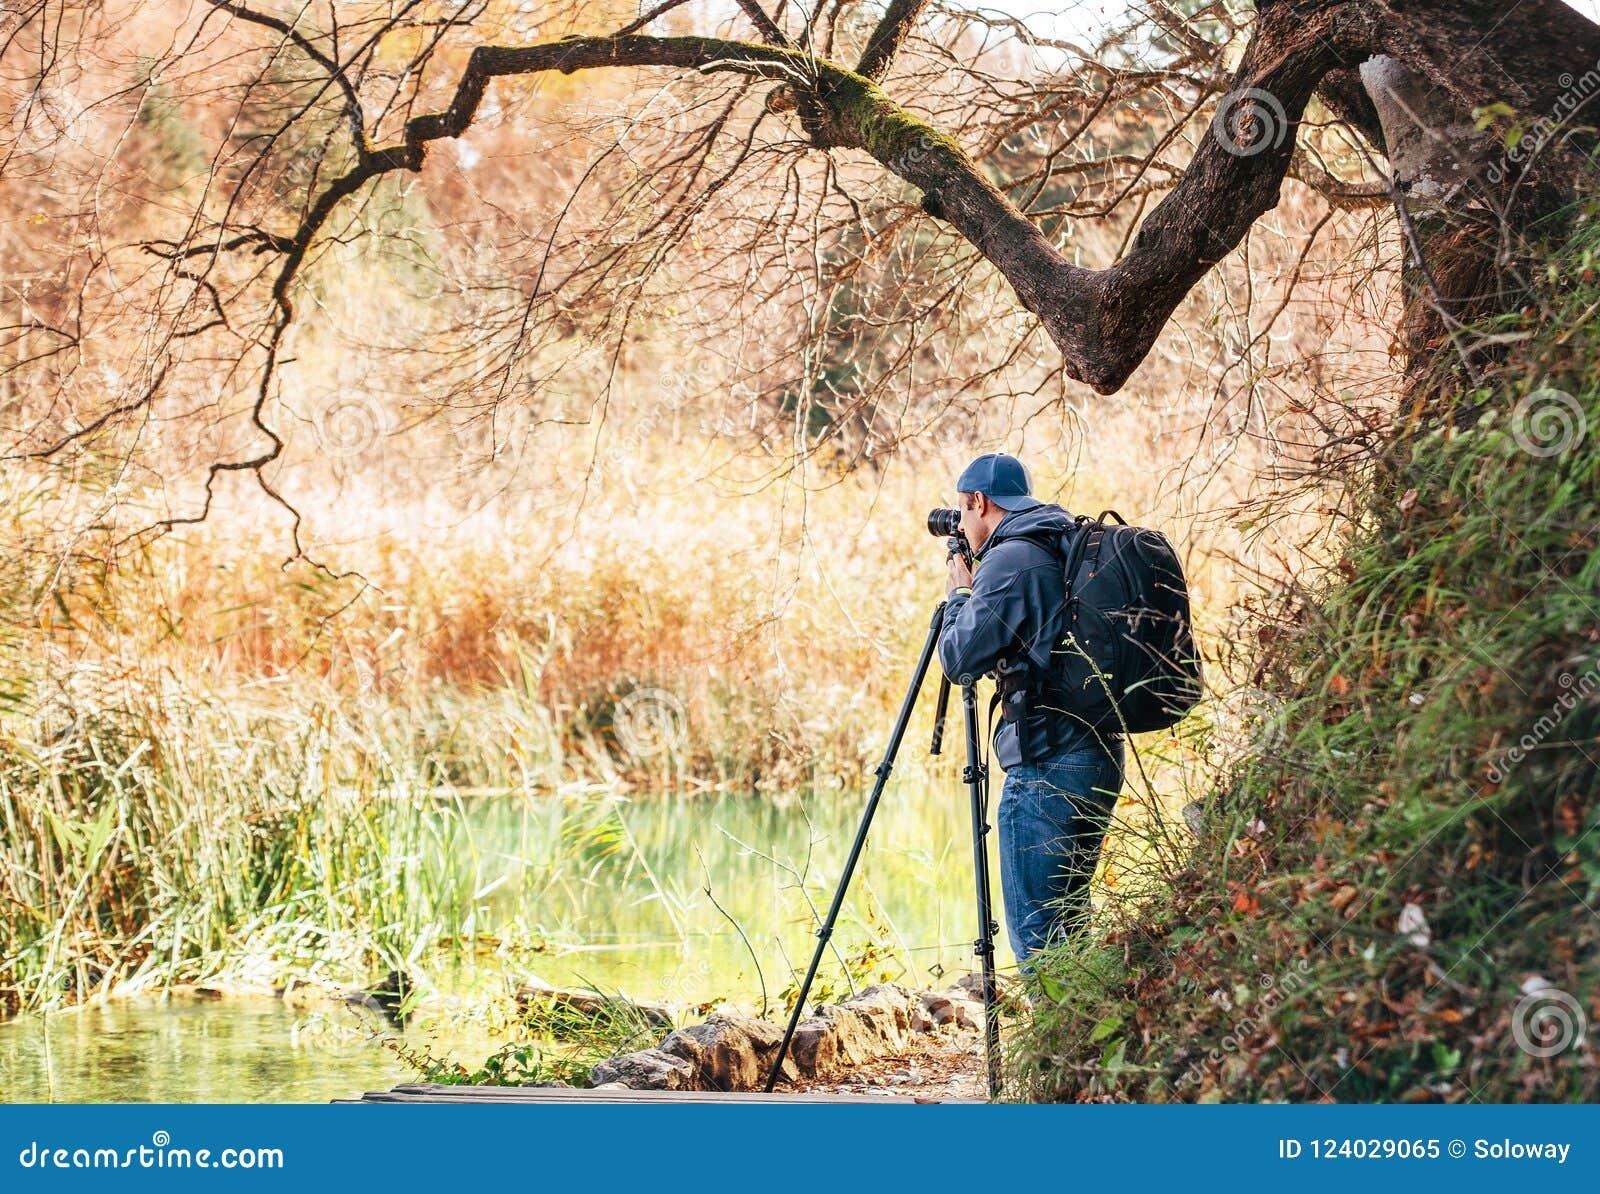 Professional photographer using a tripod takes a shot of the autumn lakes in Plitvice Lakes National Park, Croatia.